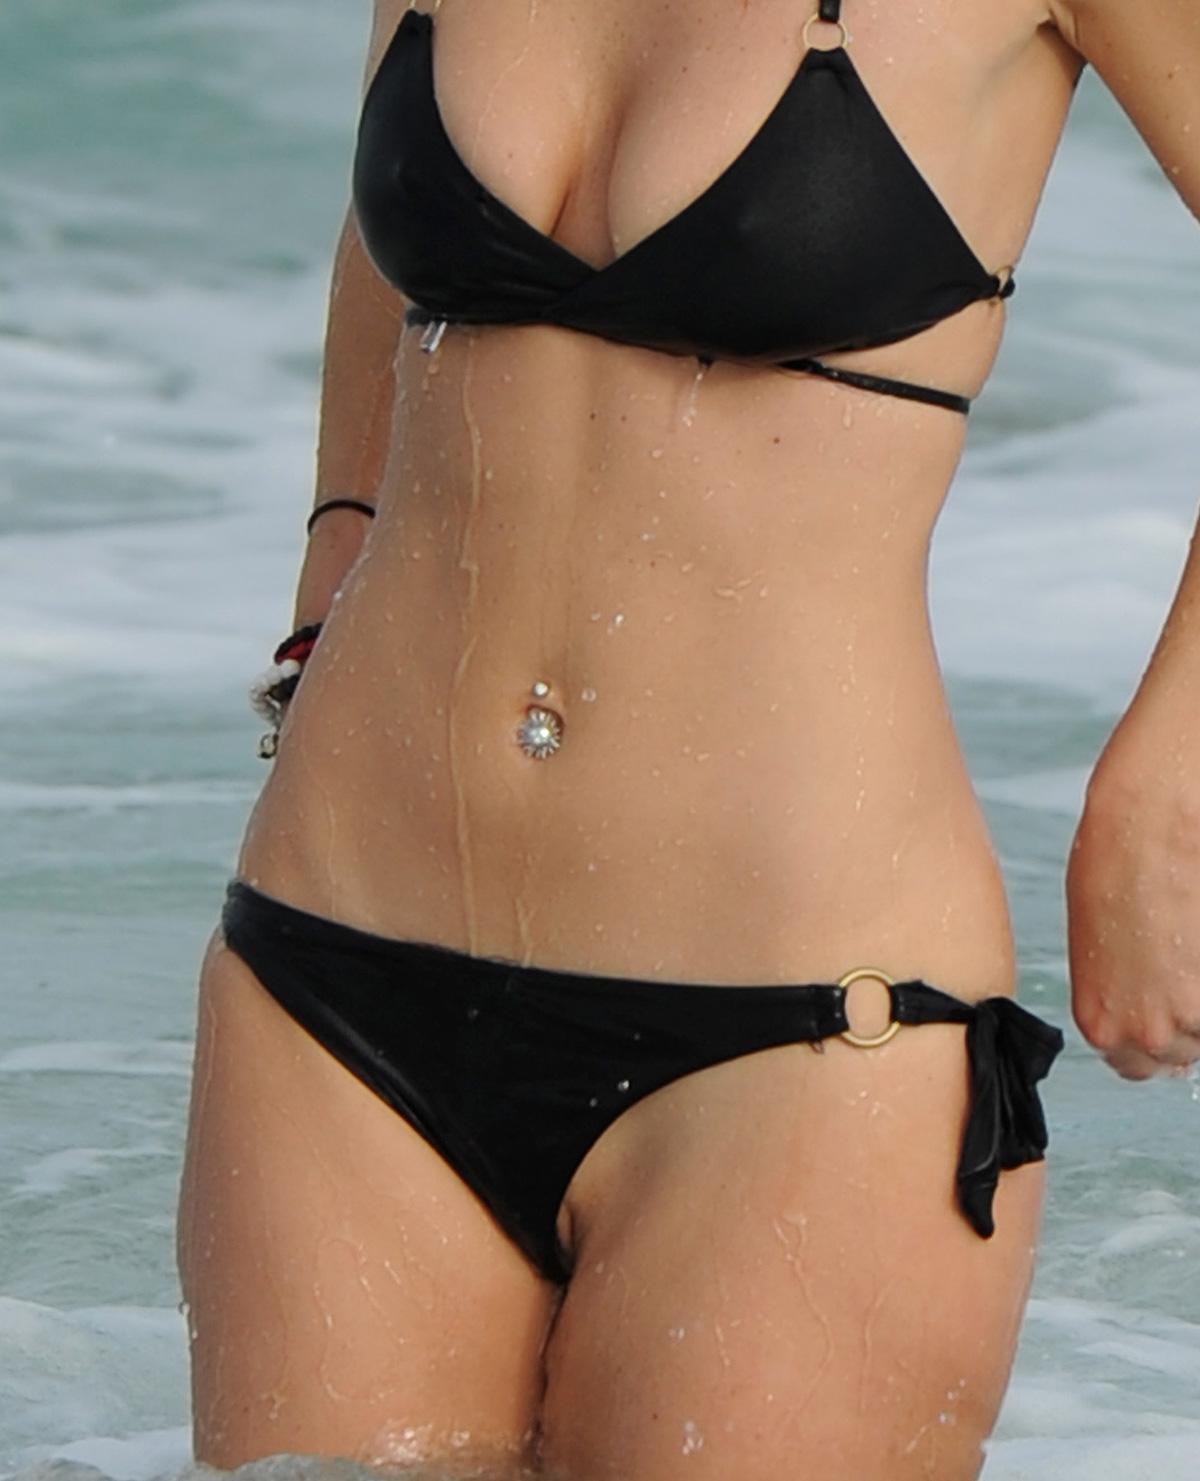 Girl photo bikini oops